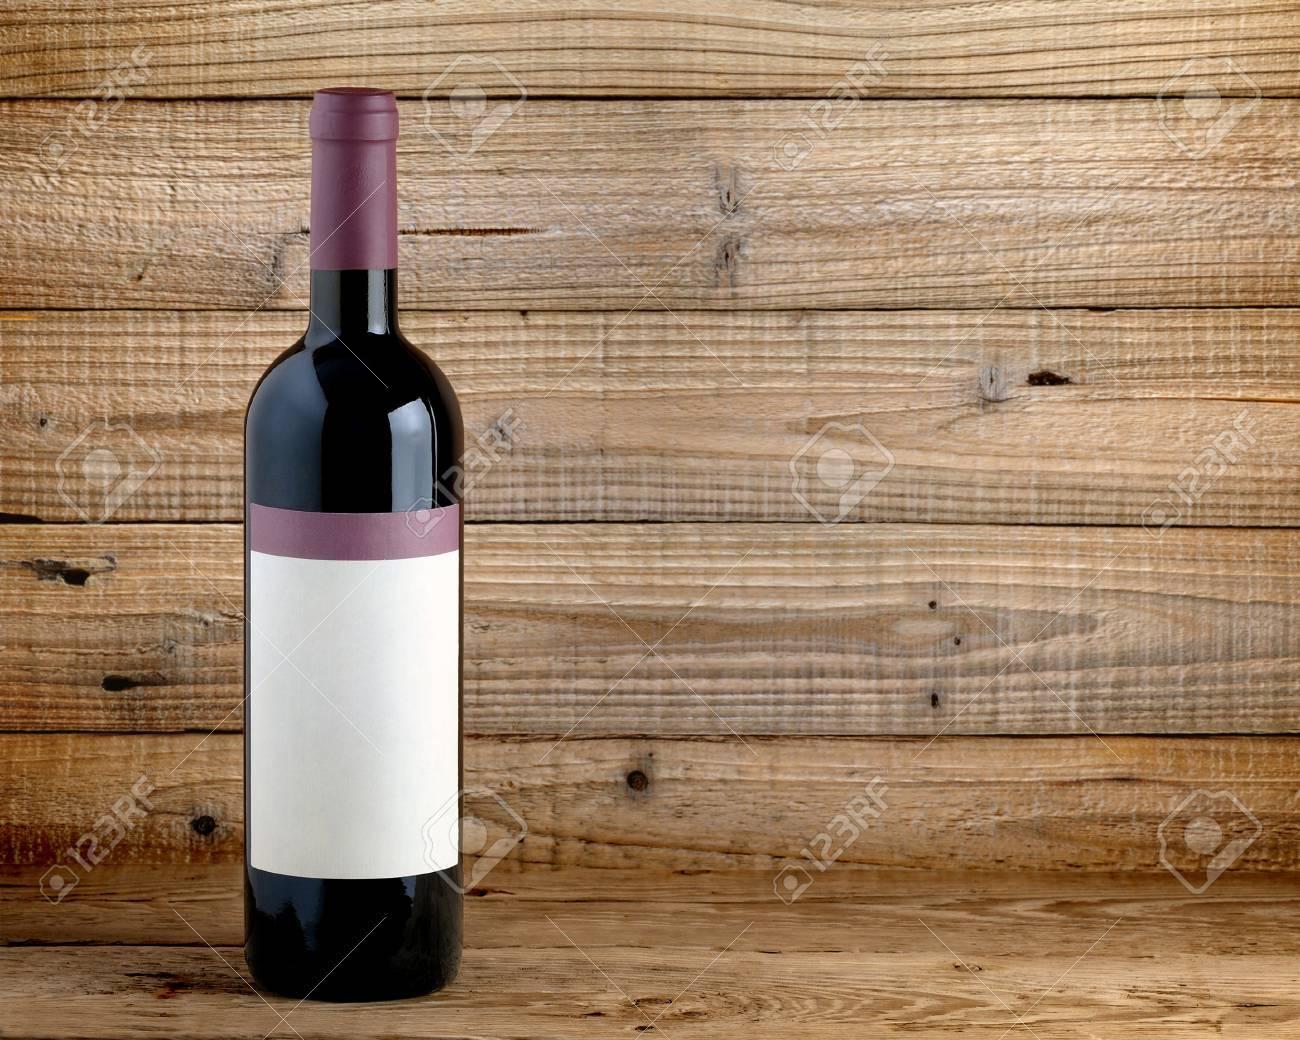 Wine bottle on wooden table - 26078009